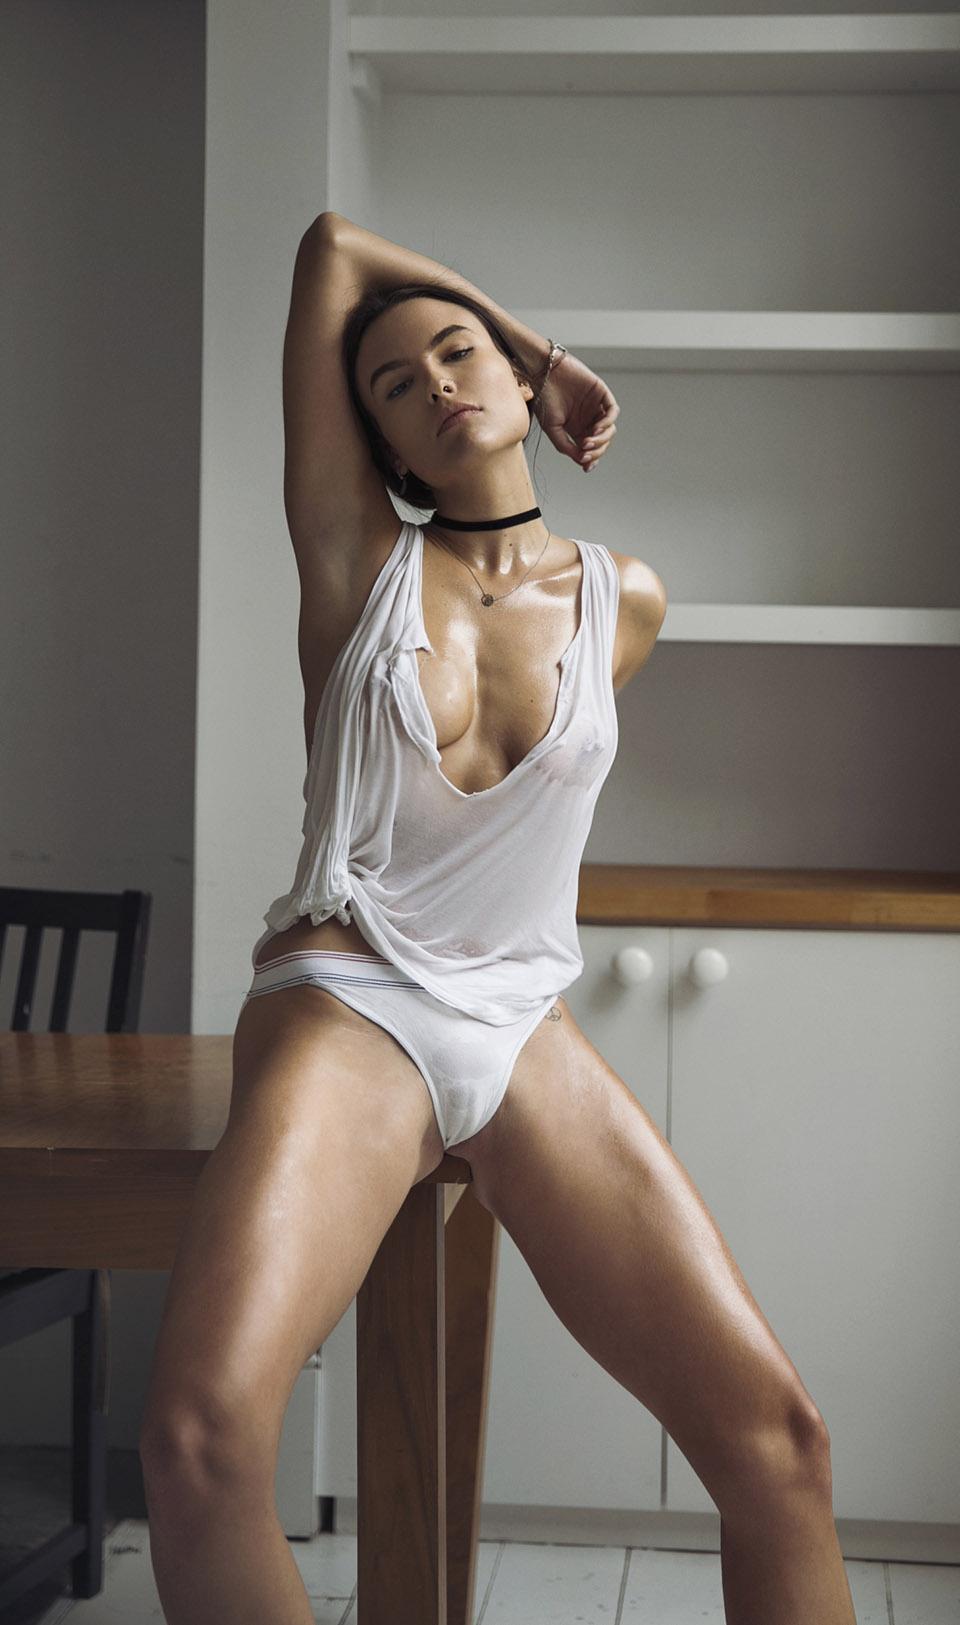 Alejandro Pereira Beki Adams breast